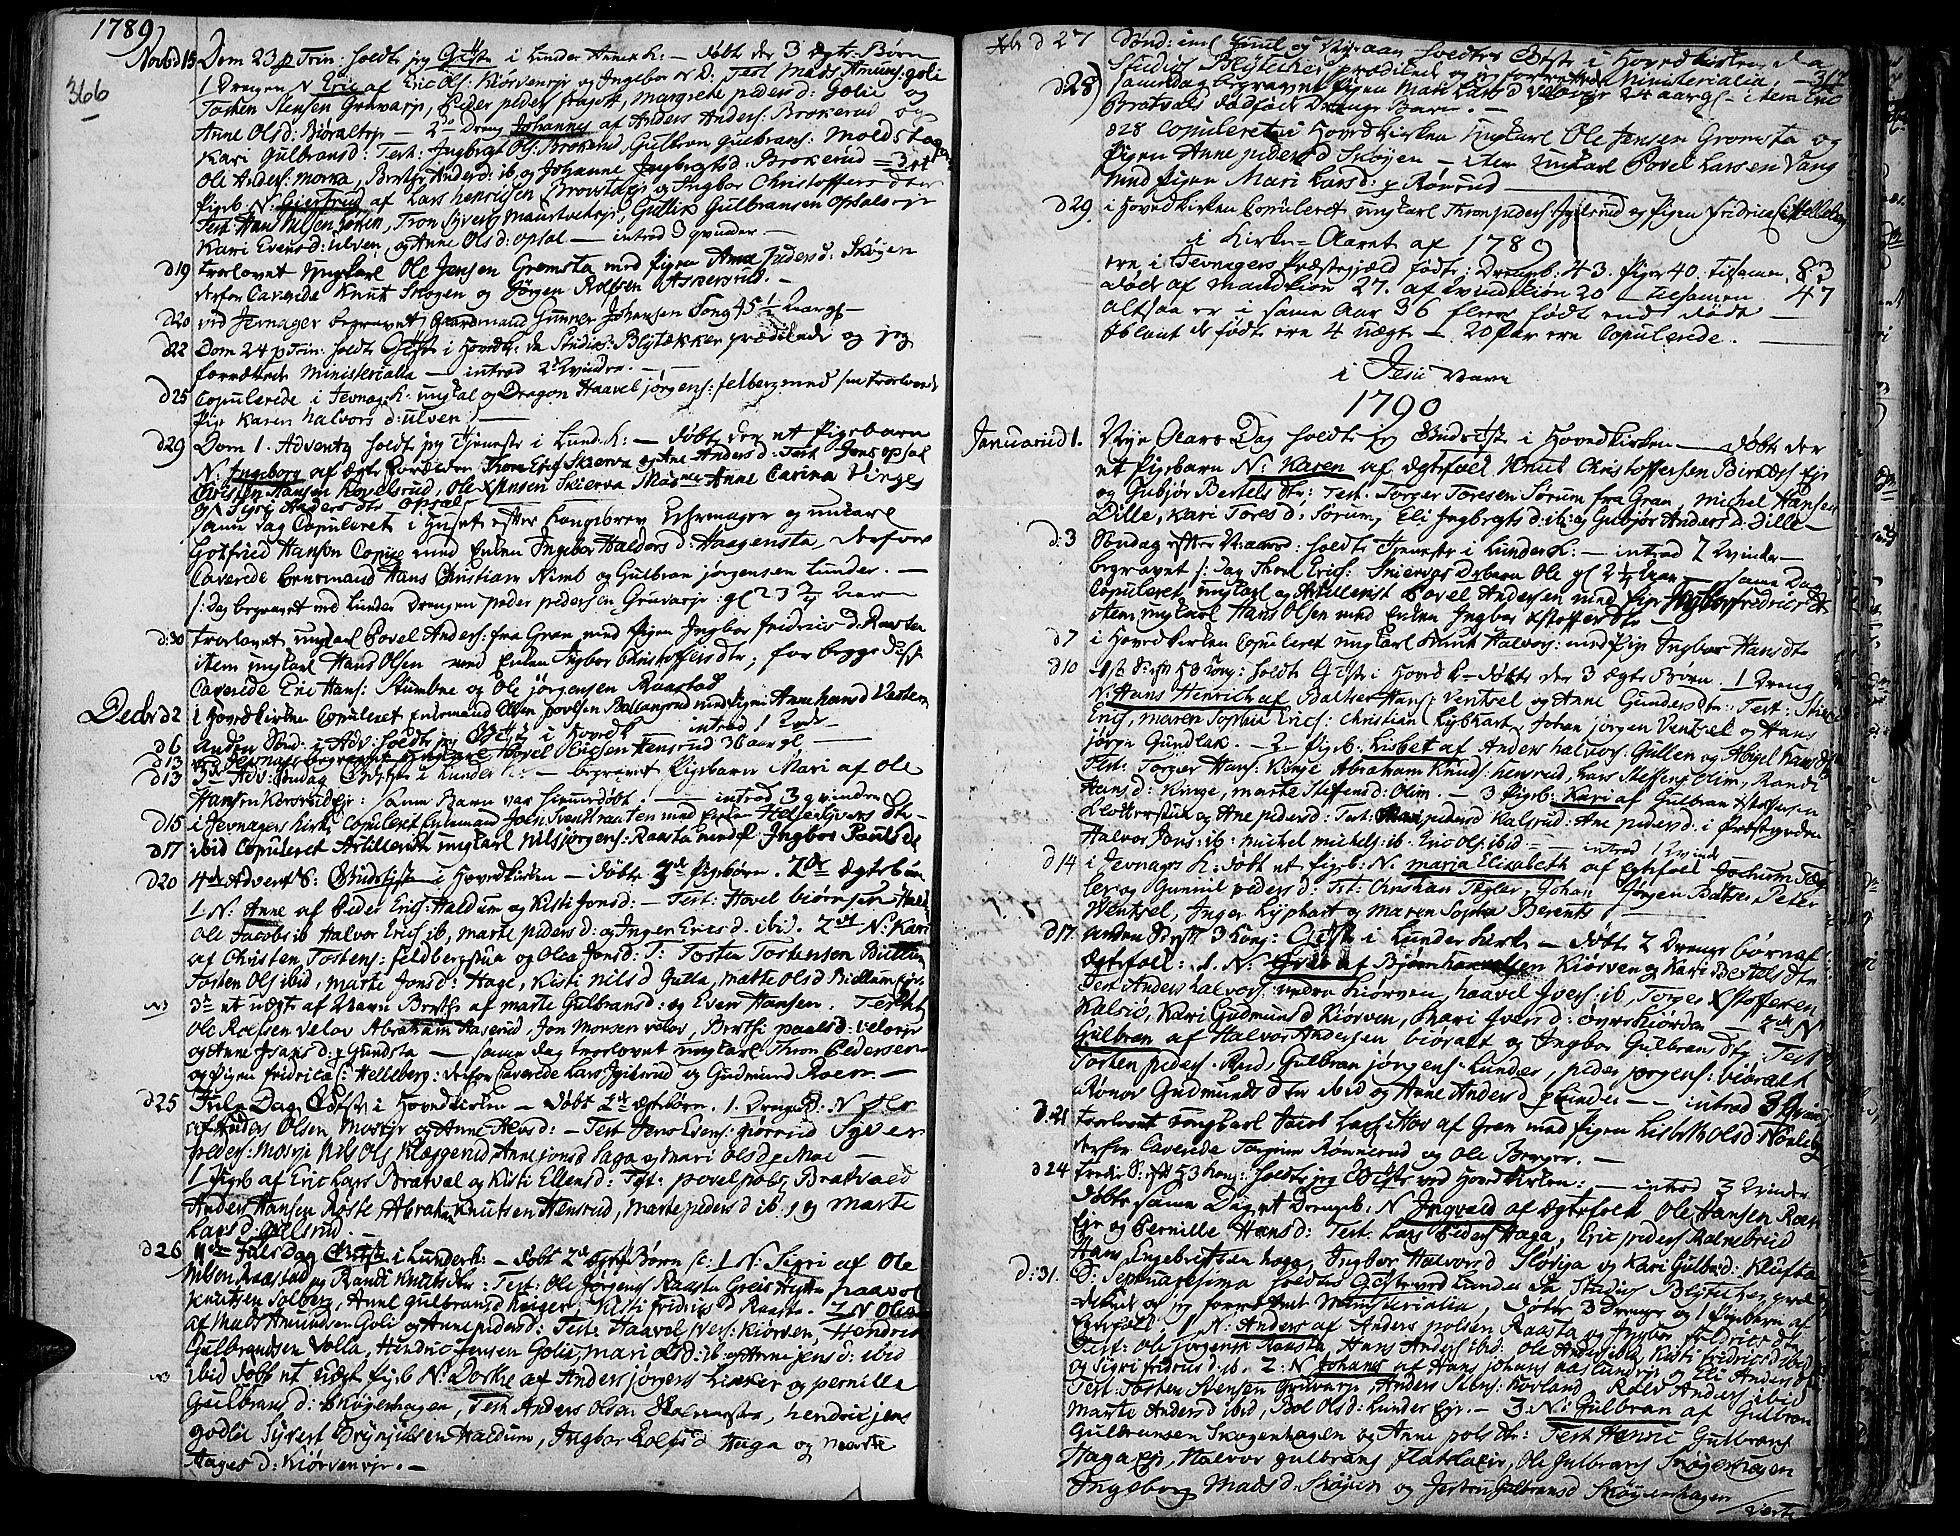 SAH, Jevnaker prestekontor, Ministerialbok nr. 3, 1752-1799, s. 366-367